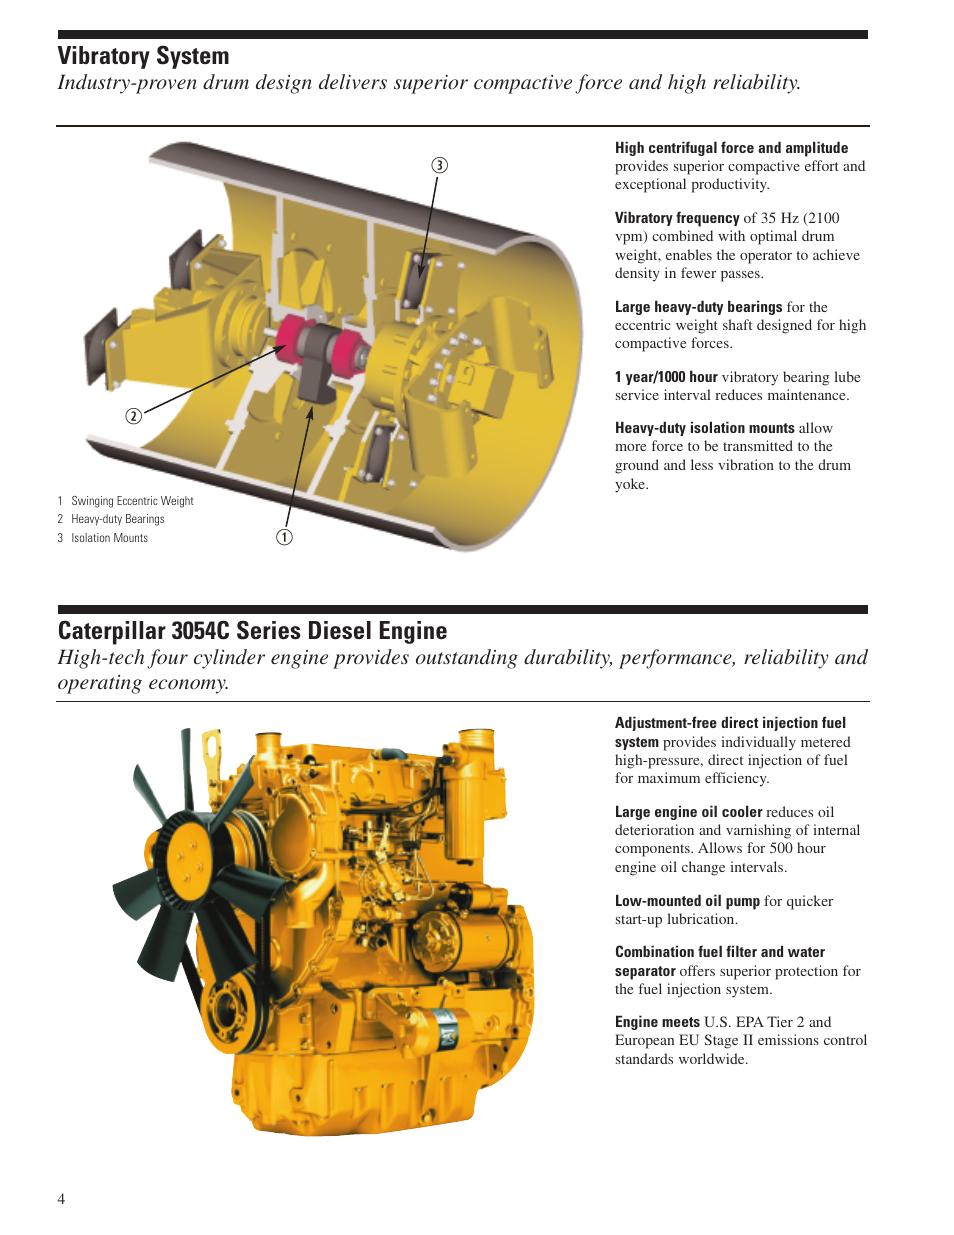 Vibratory system, Cat 3054c diesel engine, Caterpillar 3054c series diesel  engine | Milton CAT CP-323C User Manual | Page 4 / 12